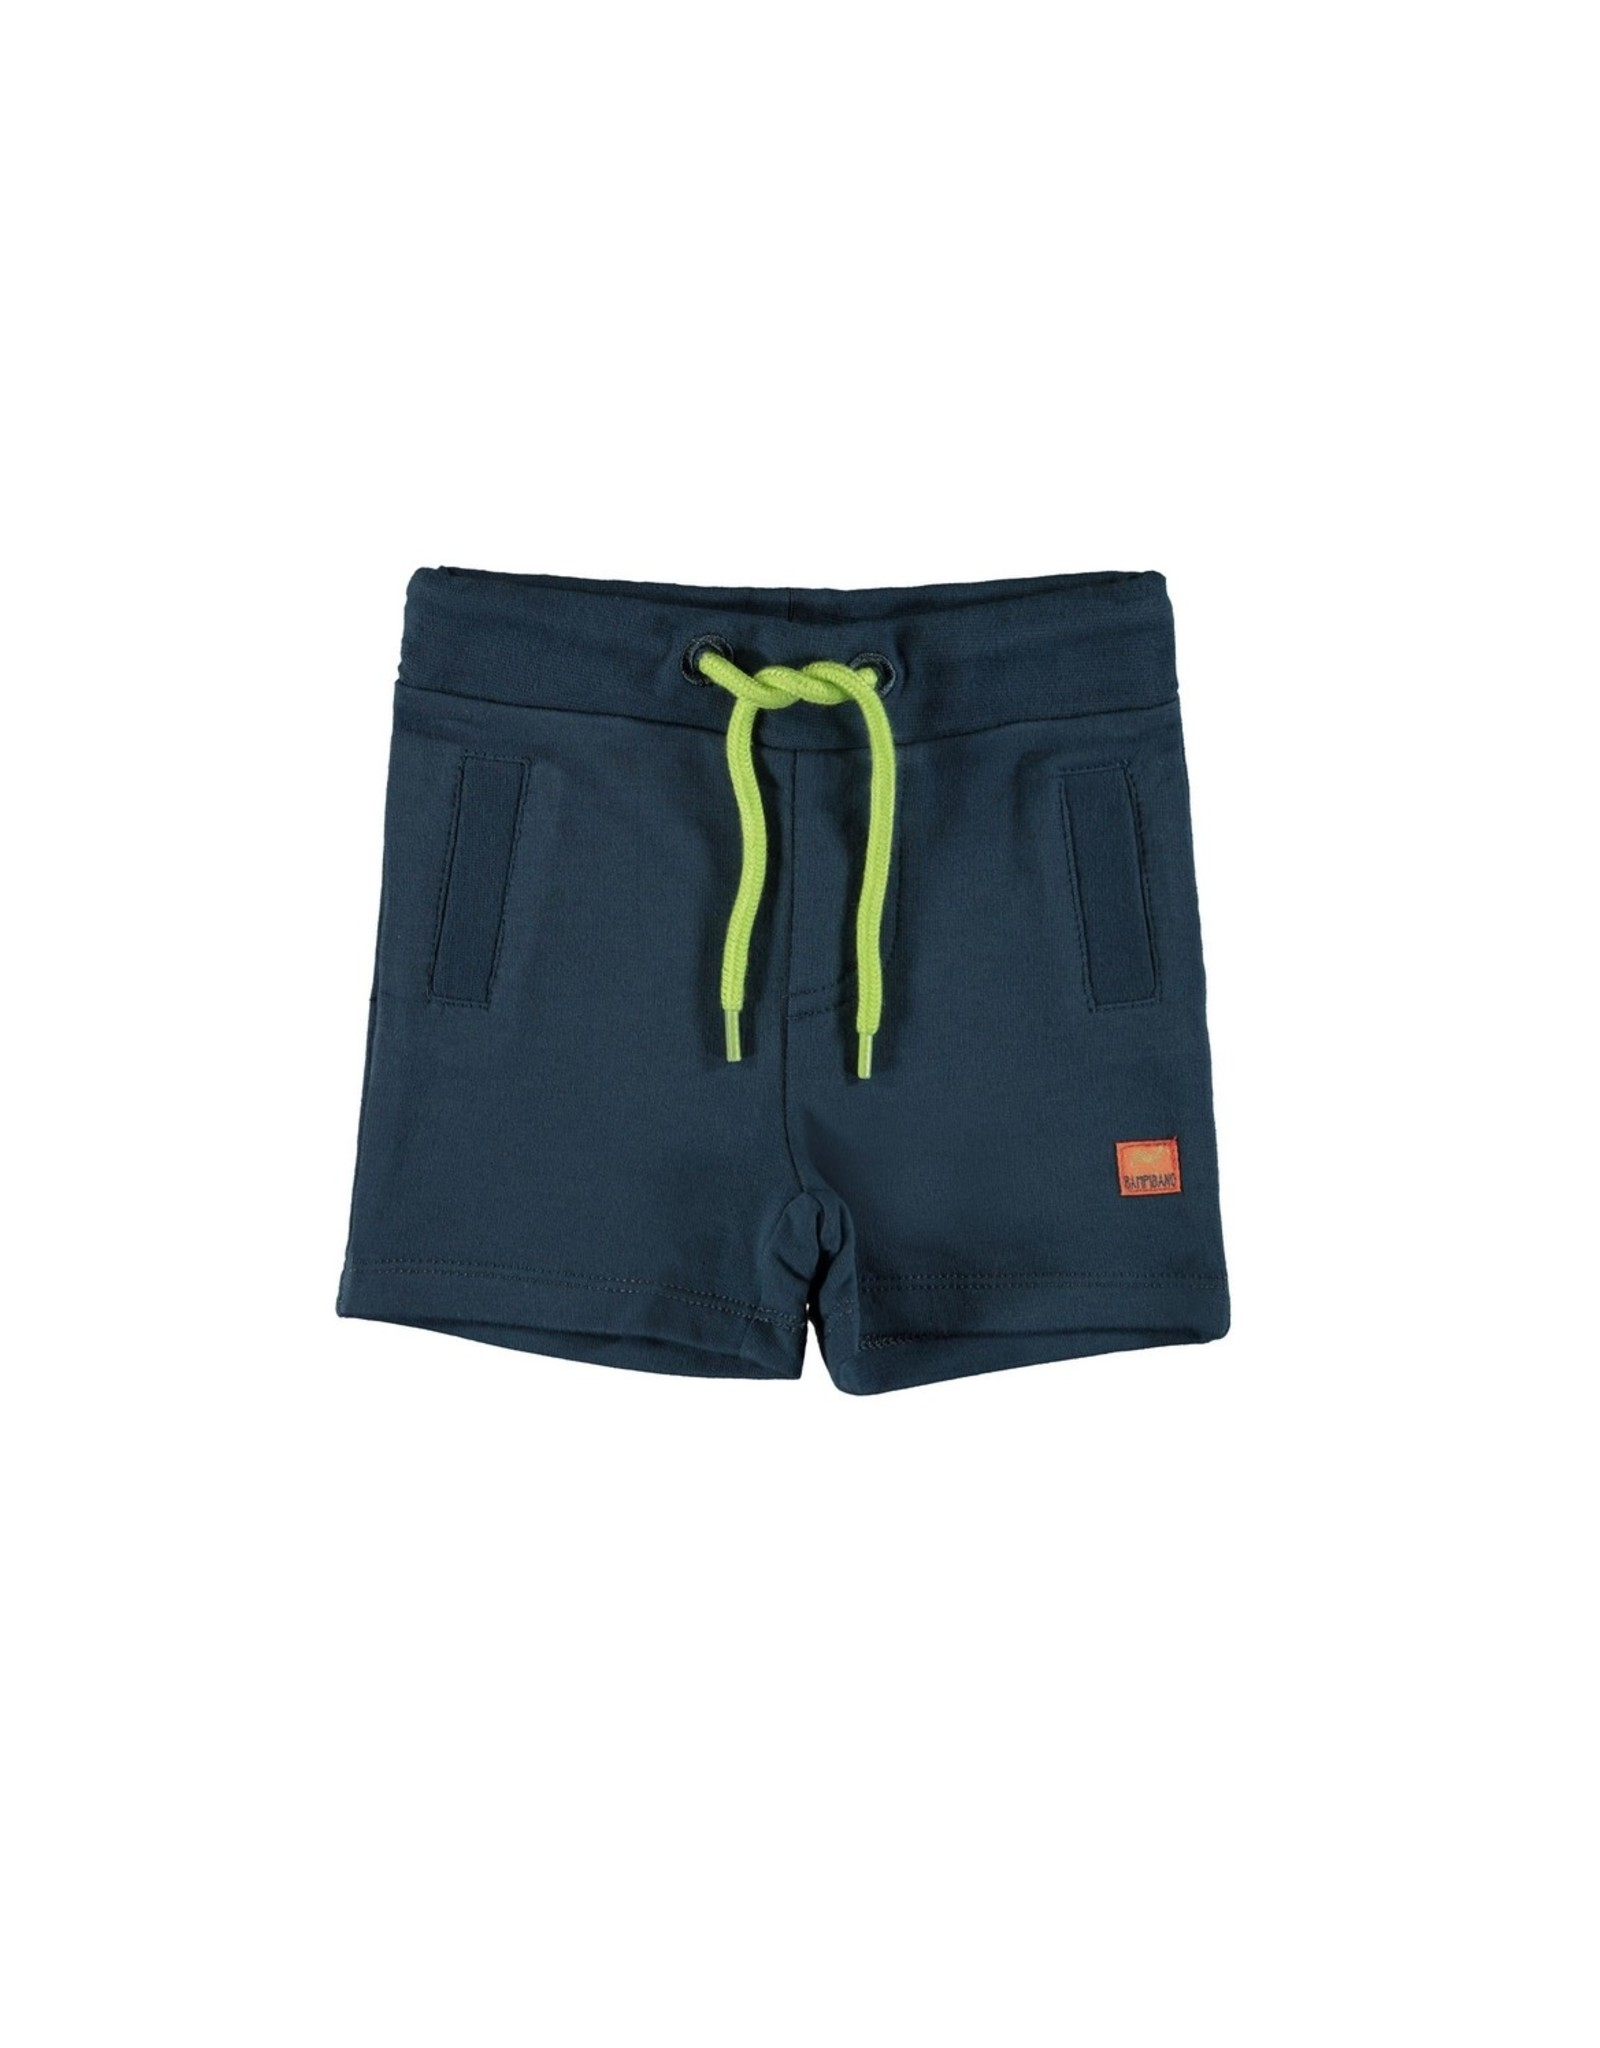 Bampidano Baby Boys sweat shorts plain, blue